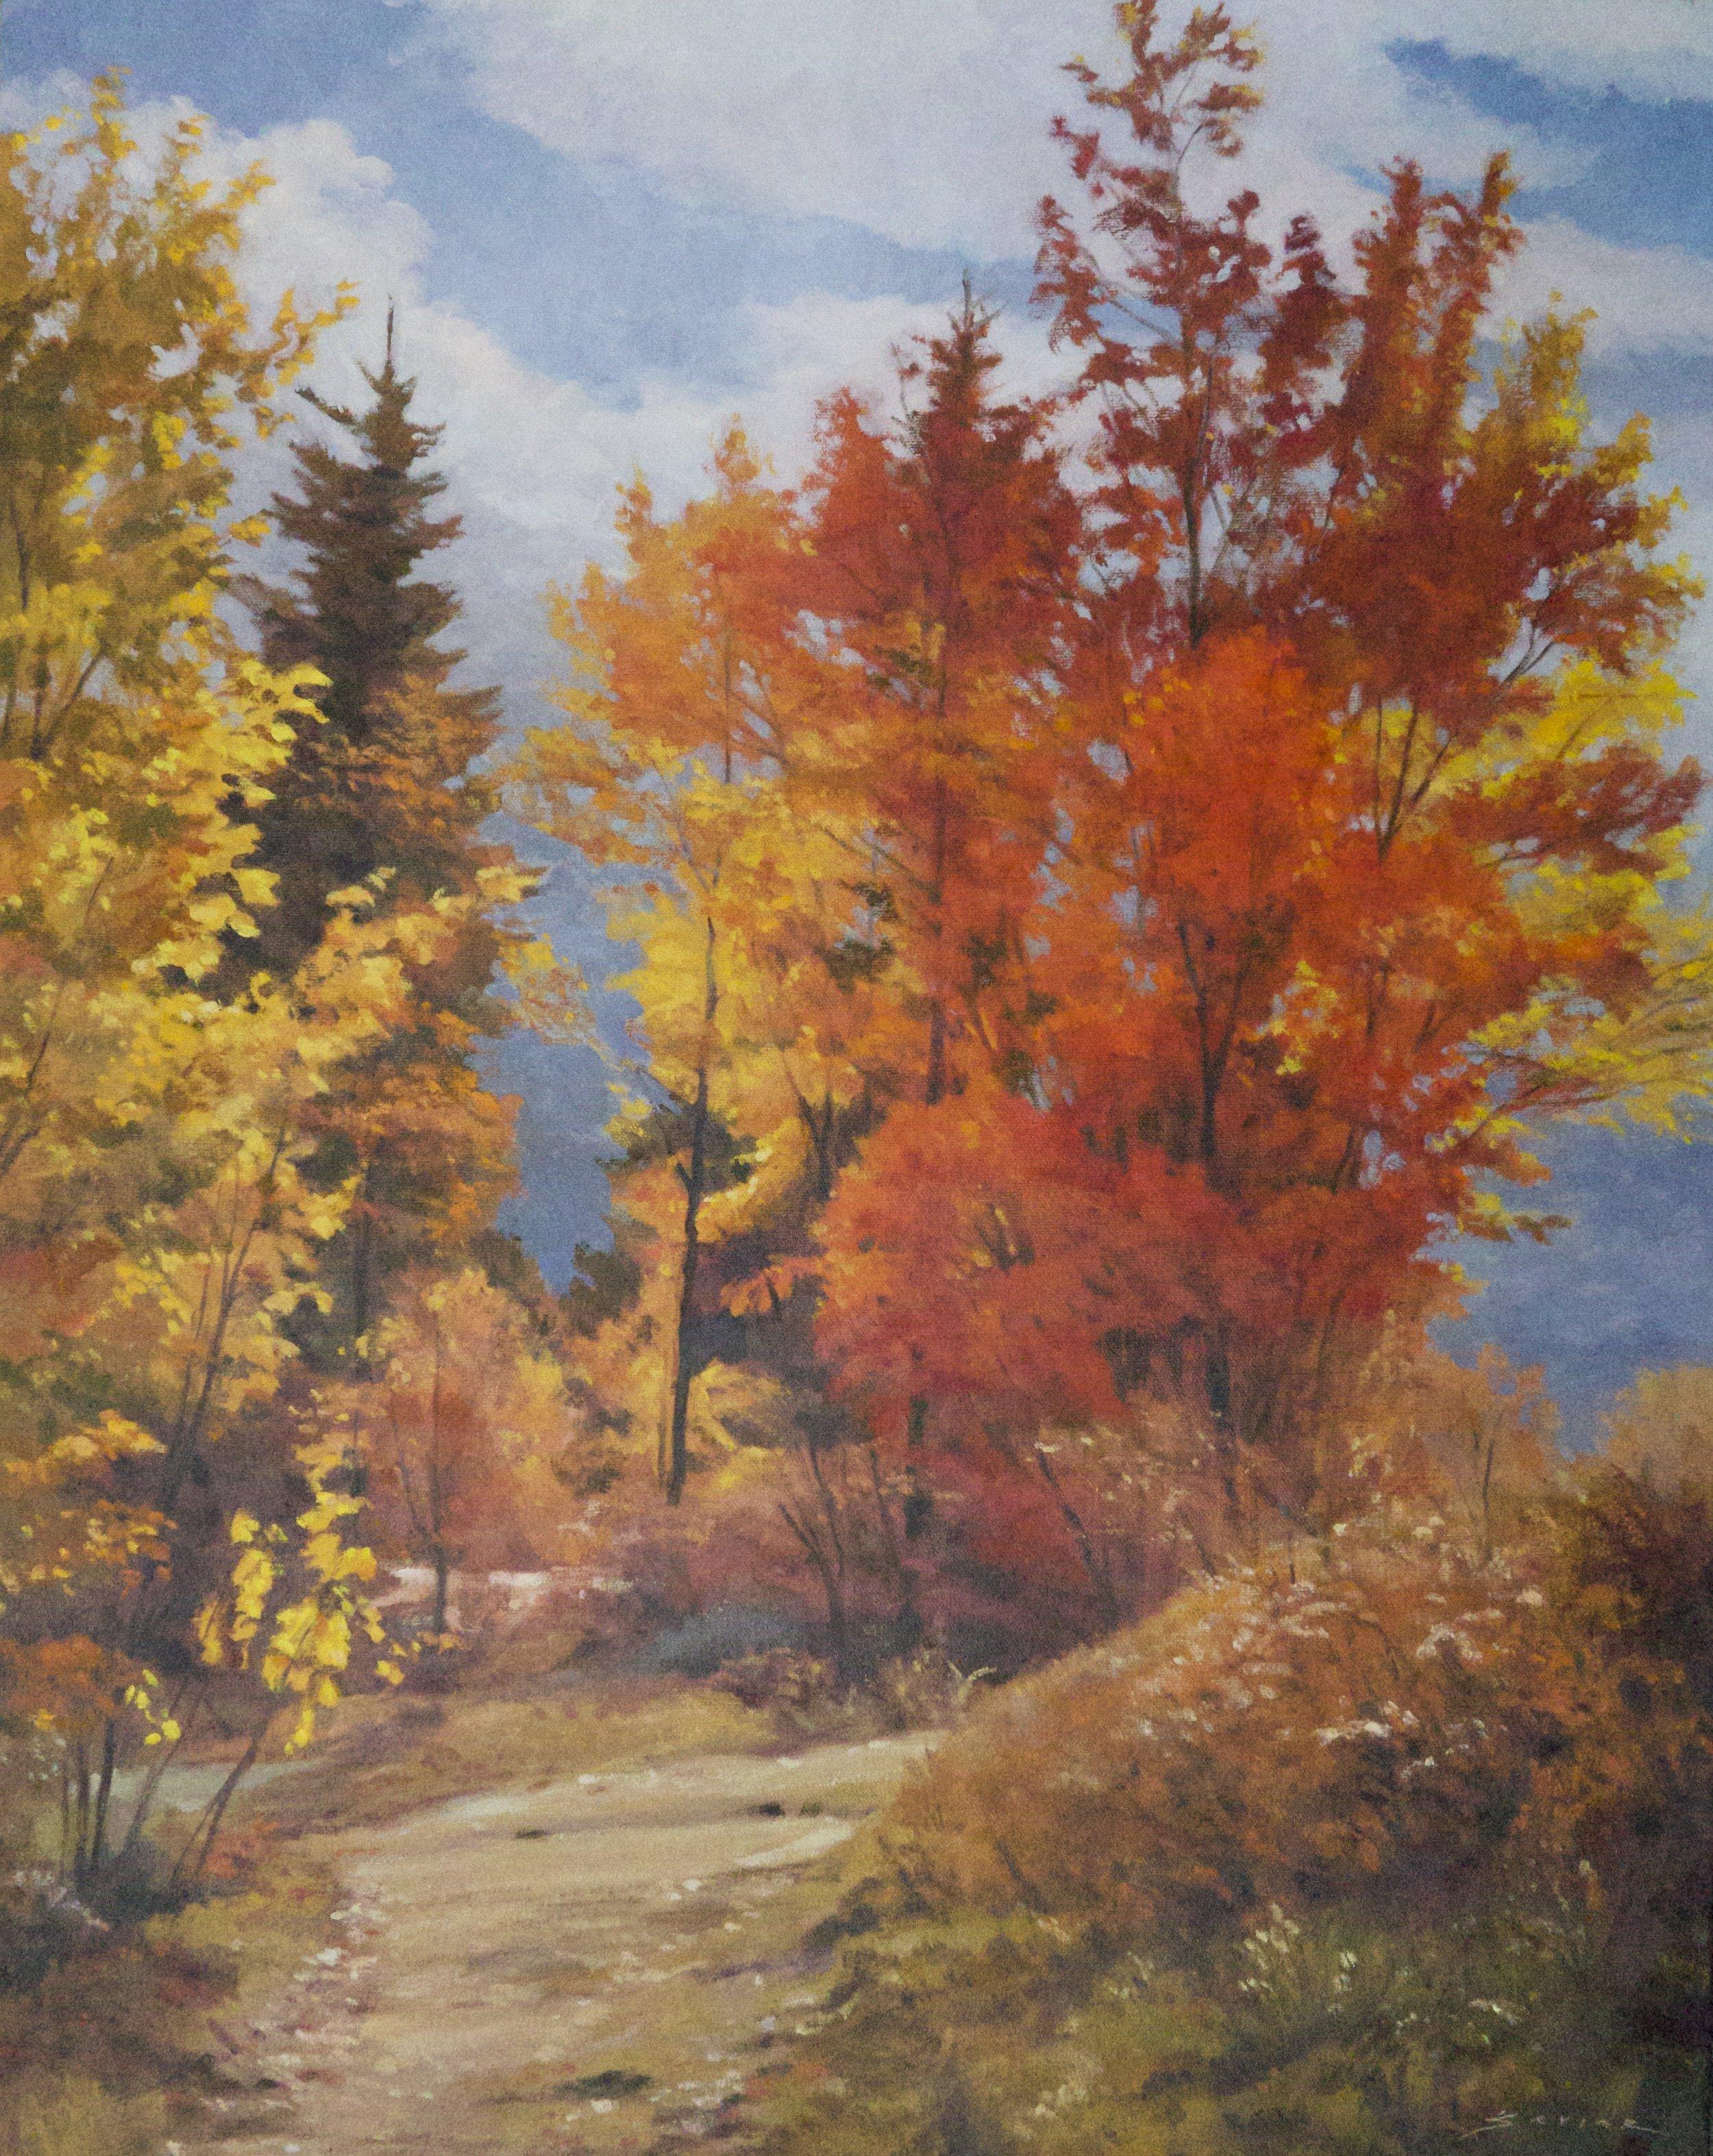 Algonquin Fall, 28 x 22, oil